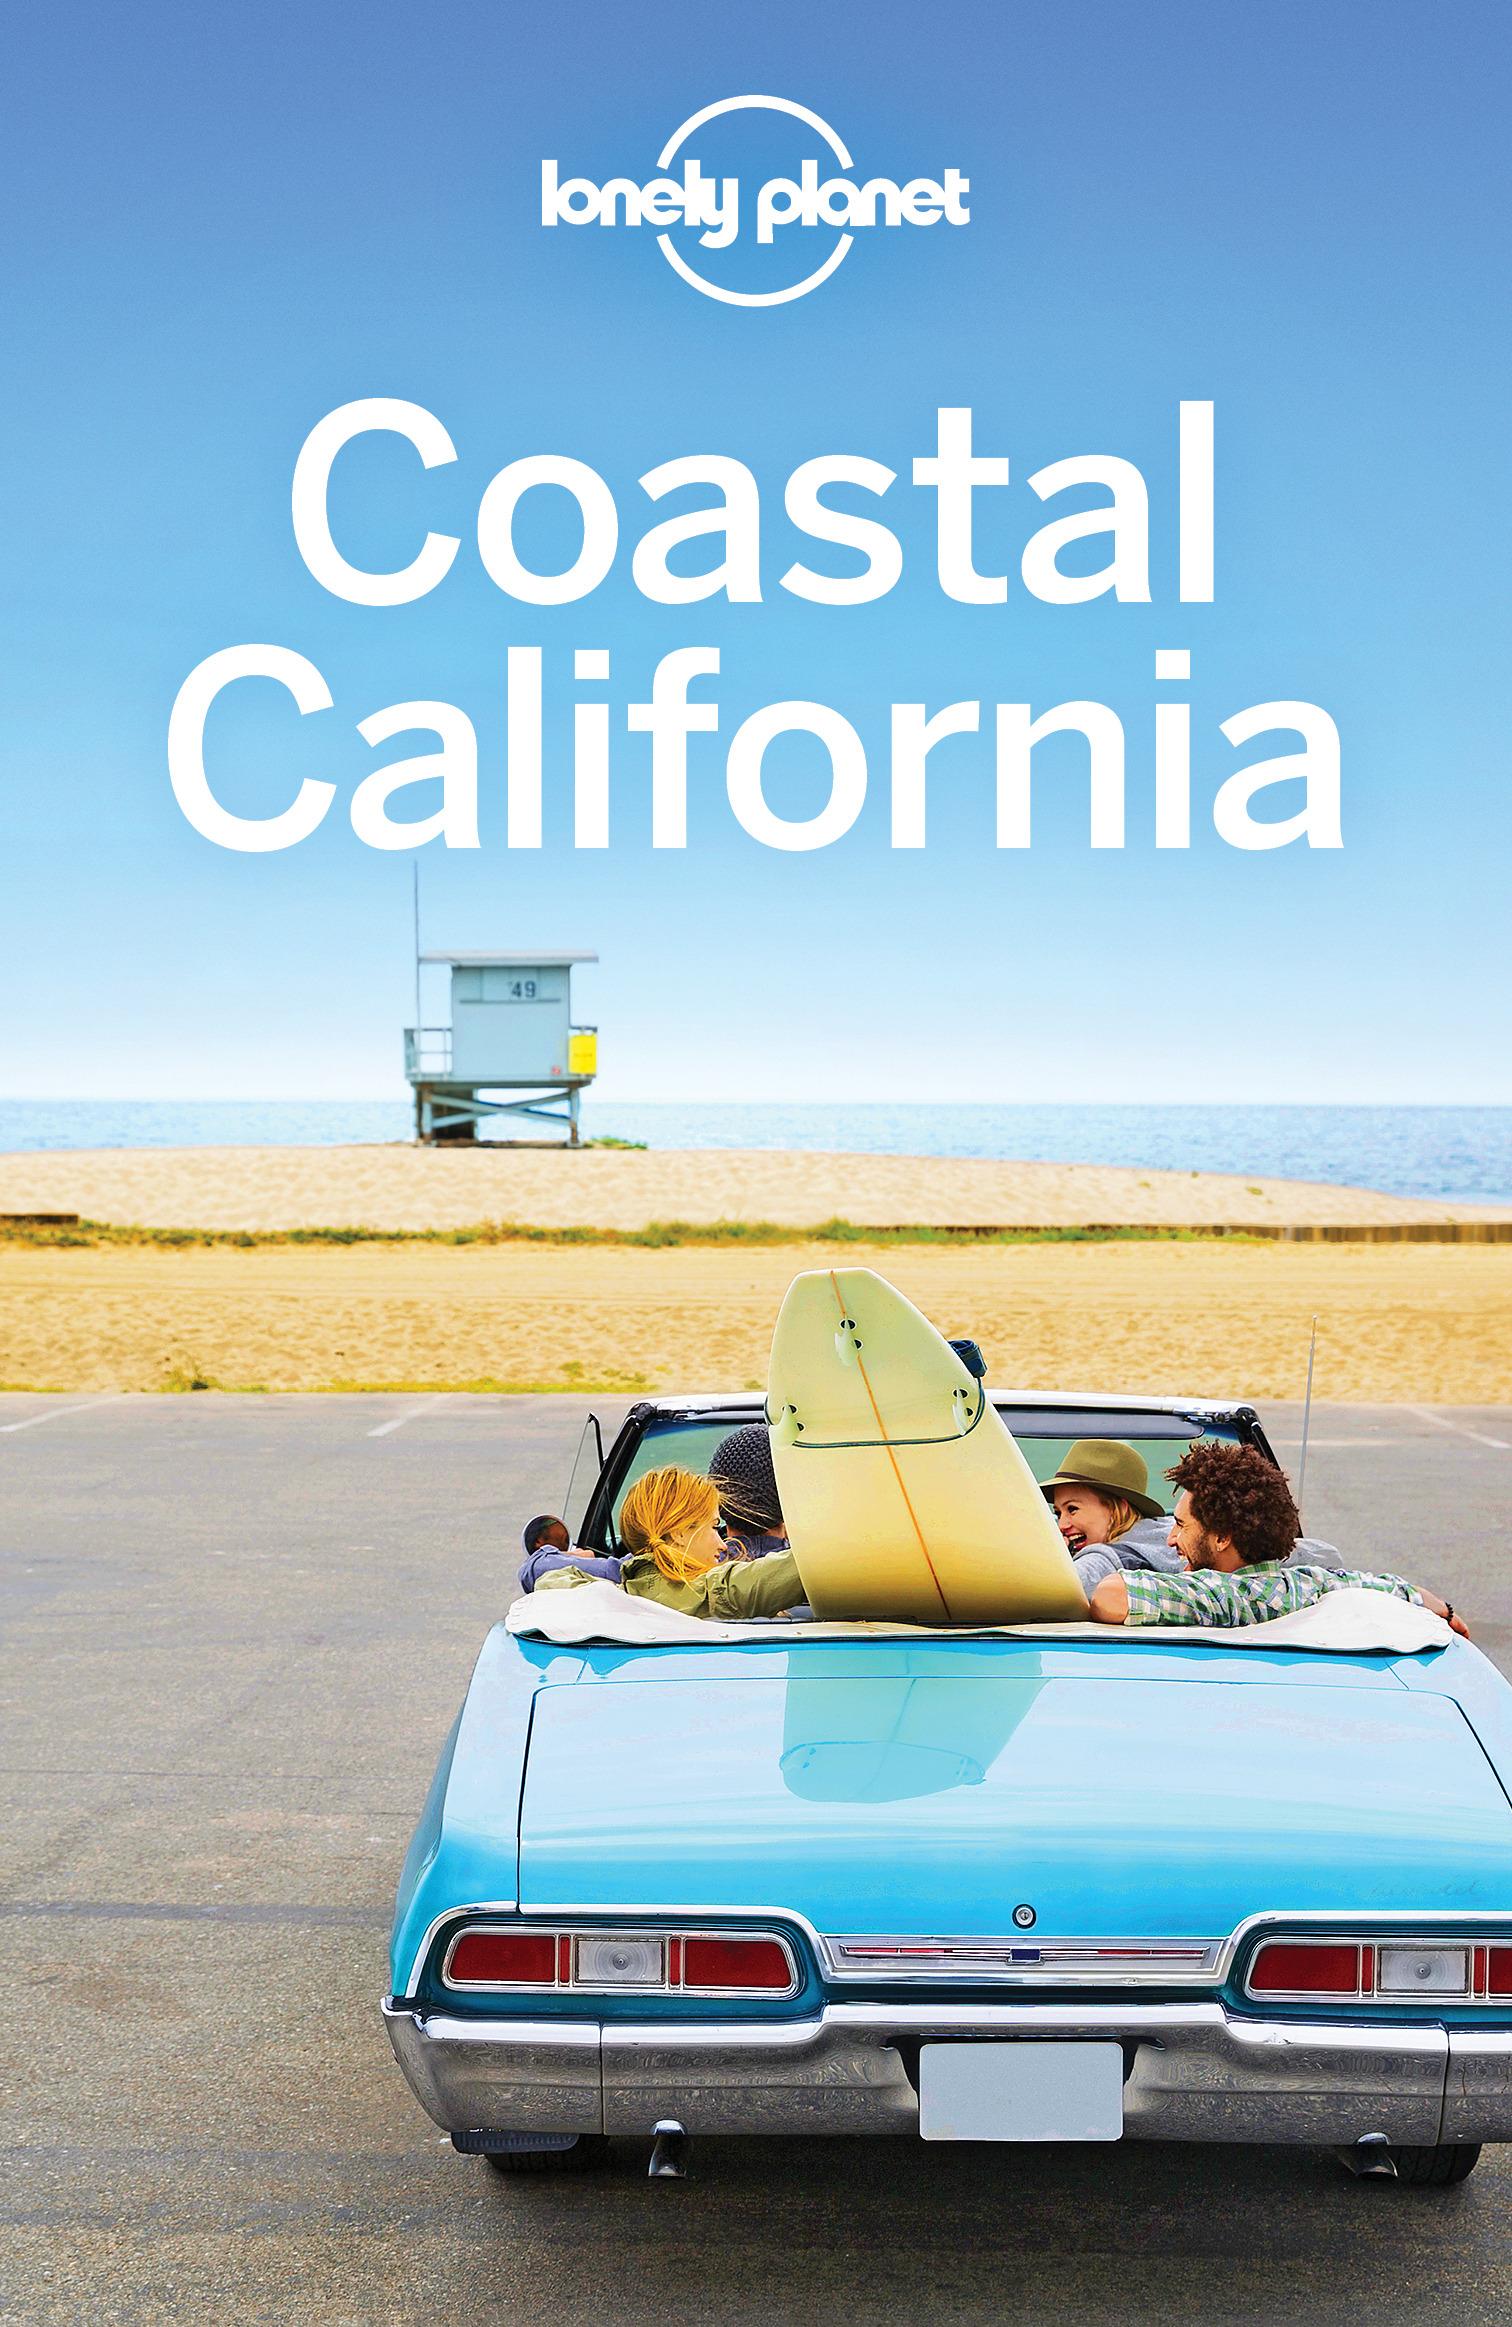 Atkinson, Brett - Lonely Planet Coastal California, ebook